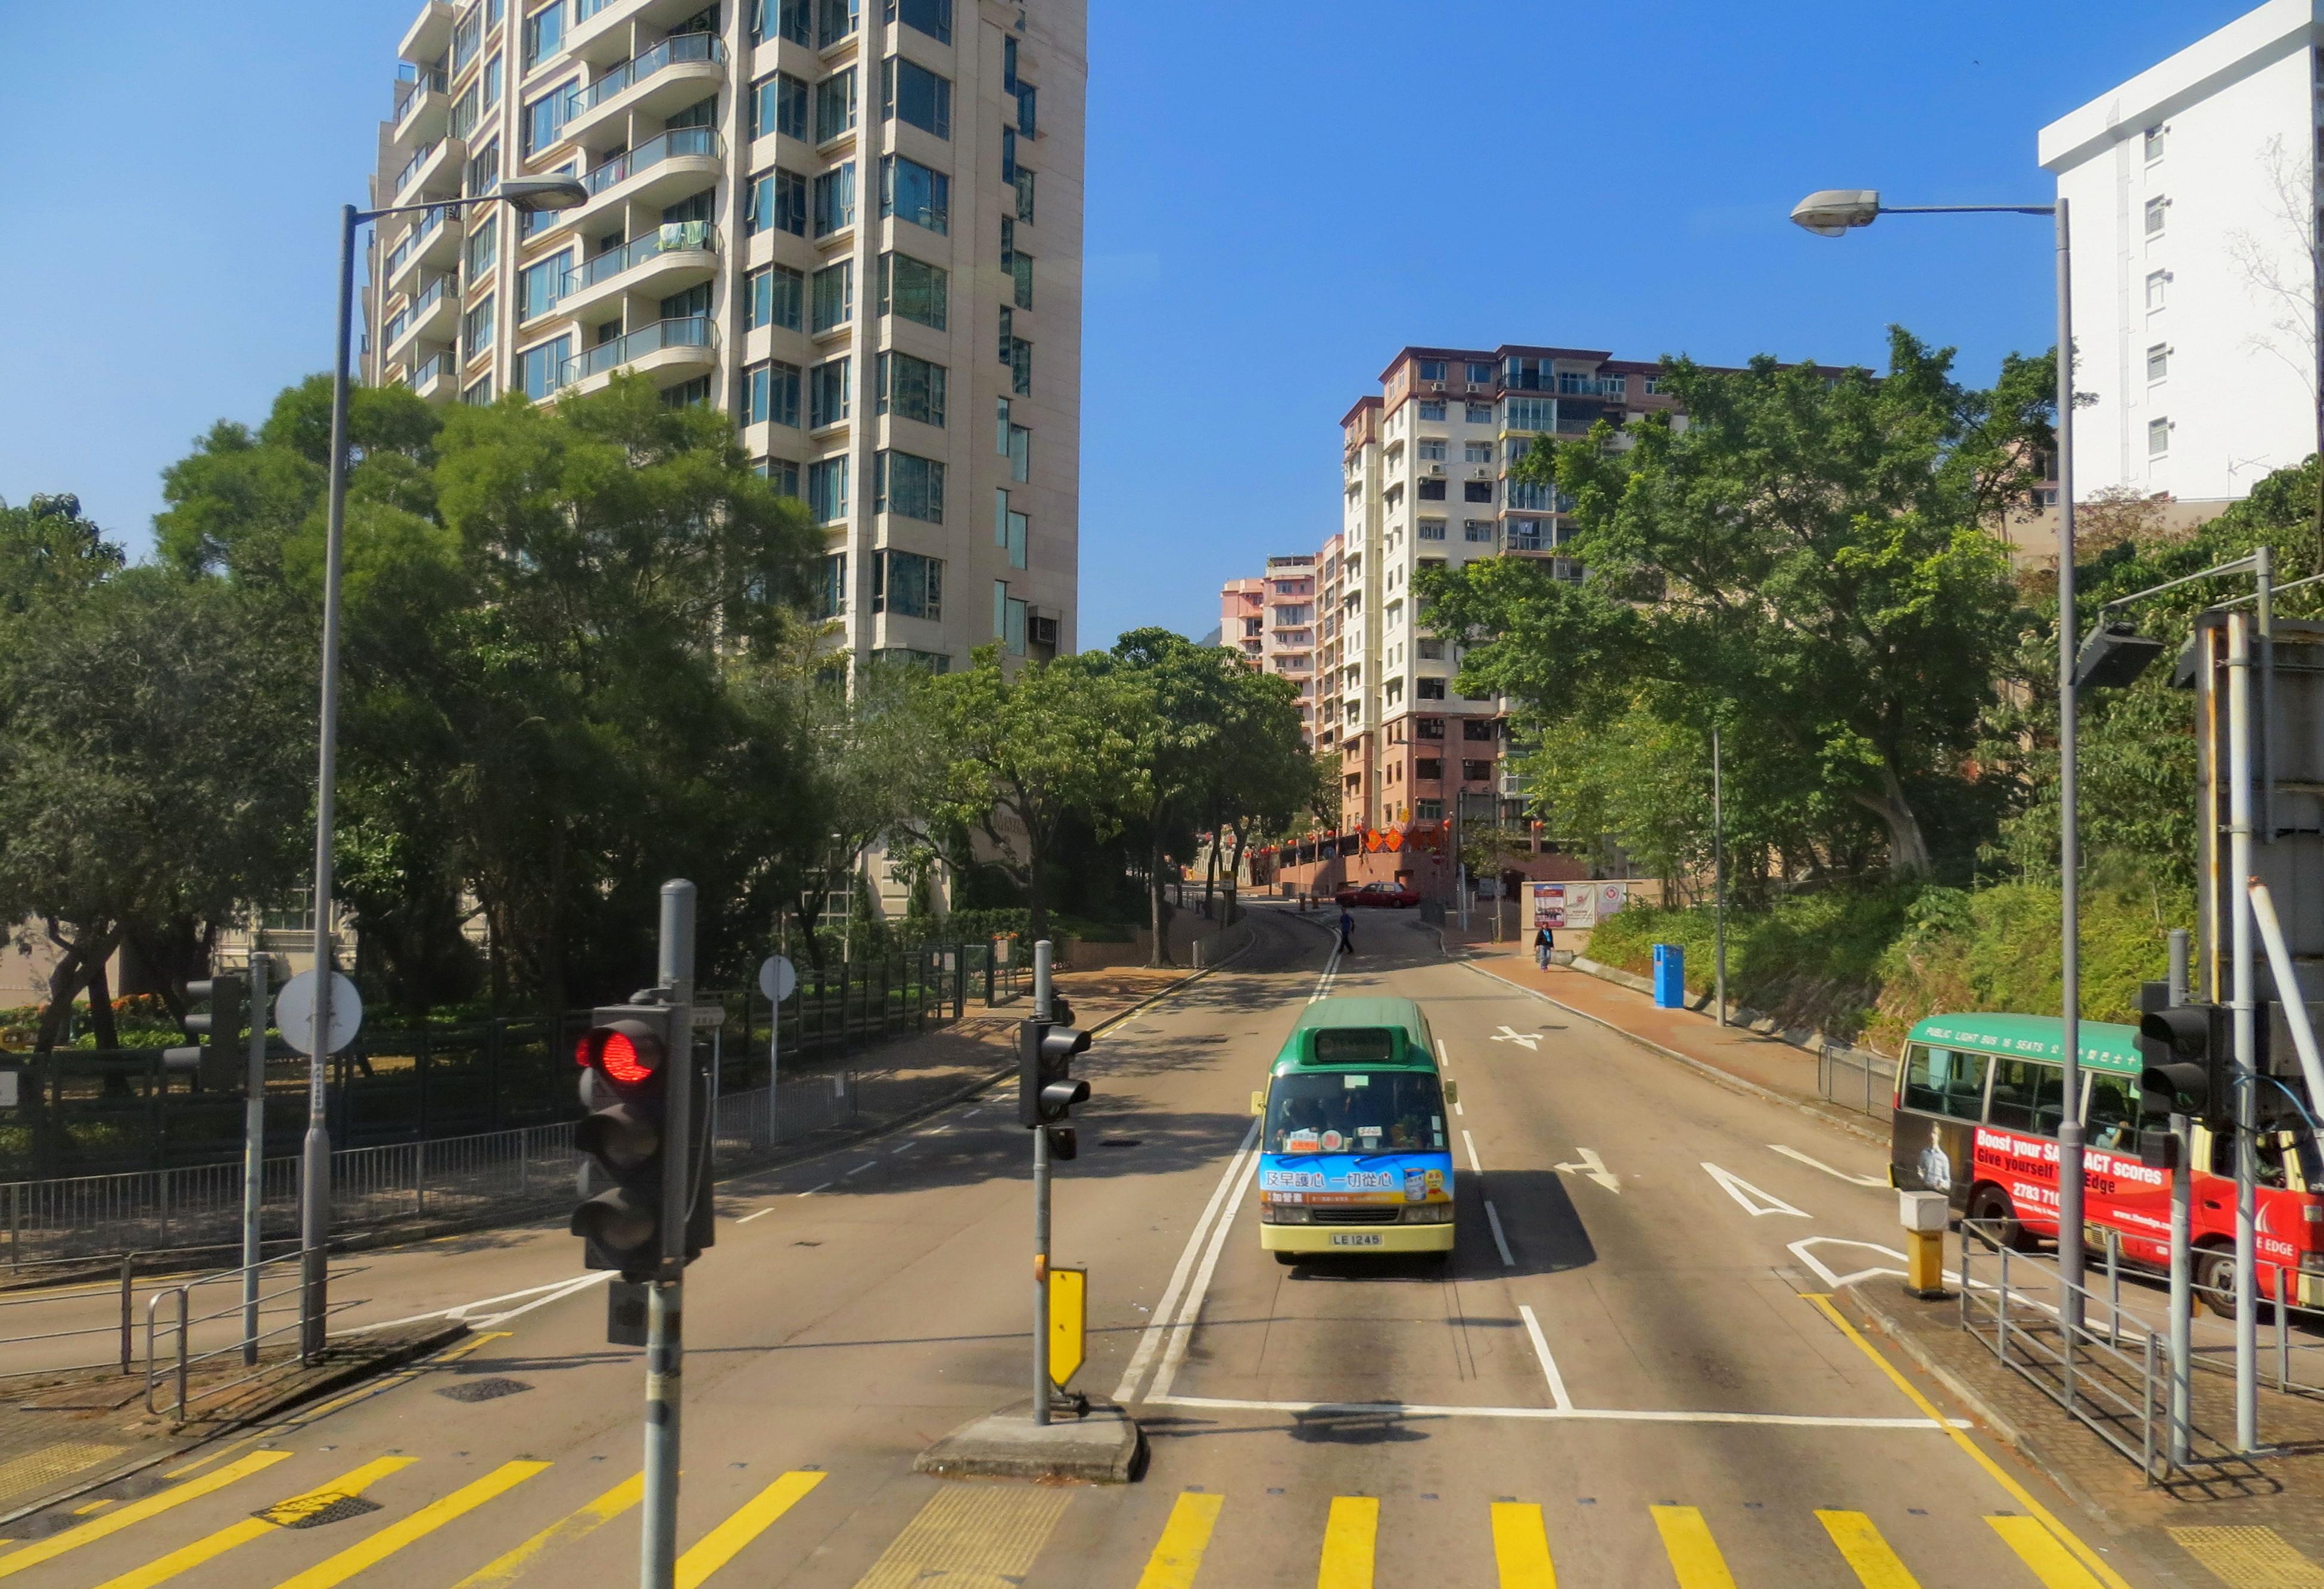 File:Broadcast Drive (Hong Kong).jpg - Wikimedia Commons